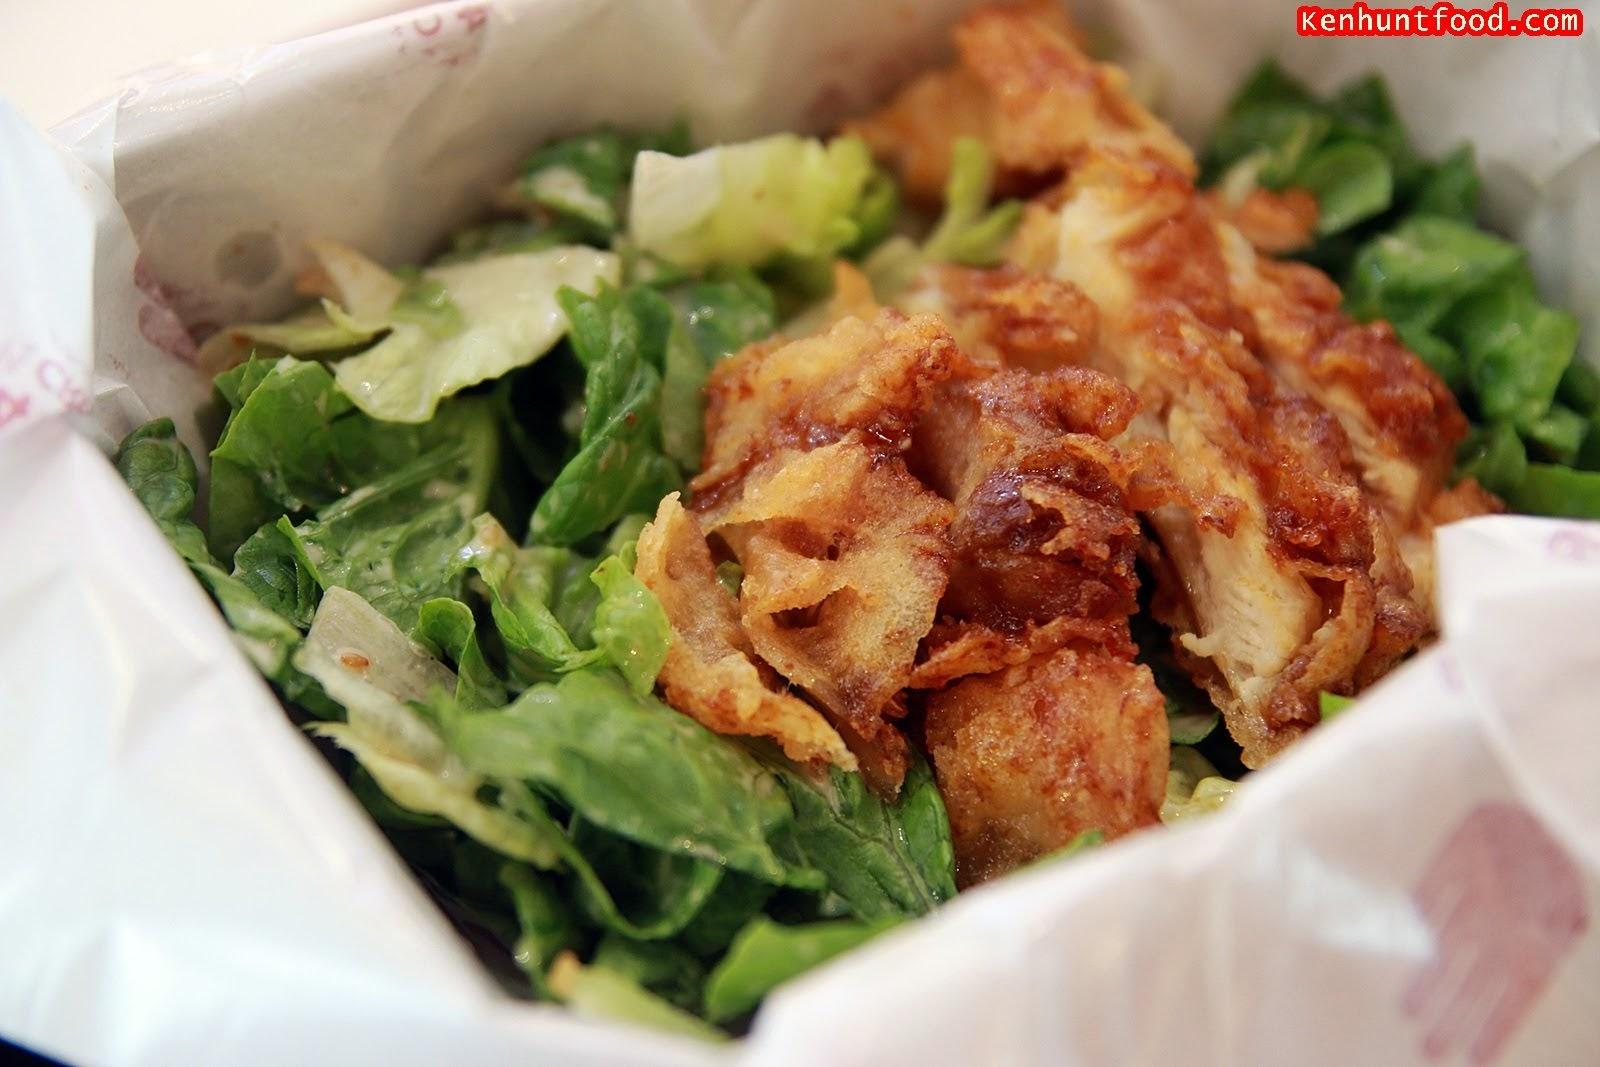 paragon muslim singles Best halal restaurants in siam (bangkok): see 1978 tripadvisor traveler  reviews of halal restaurants in siam bangkok.